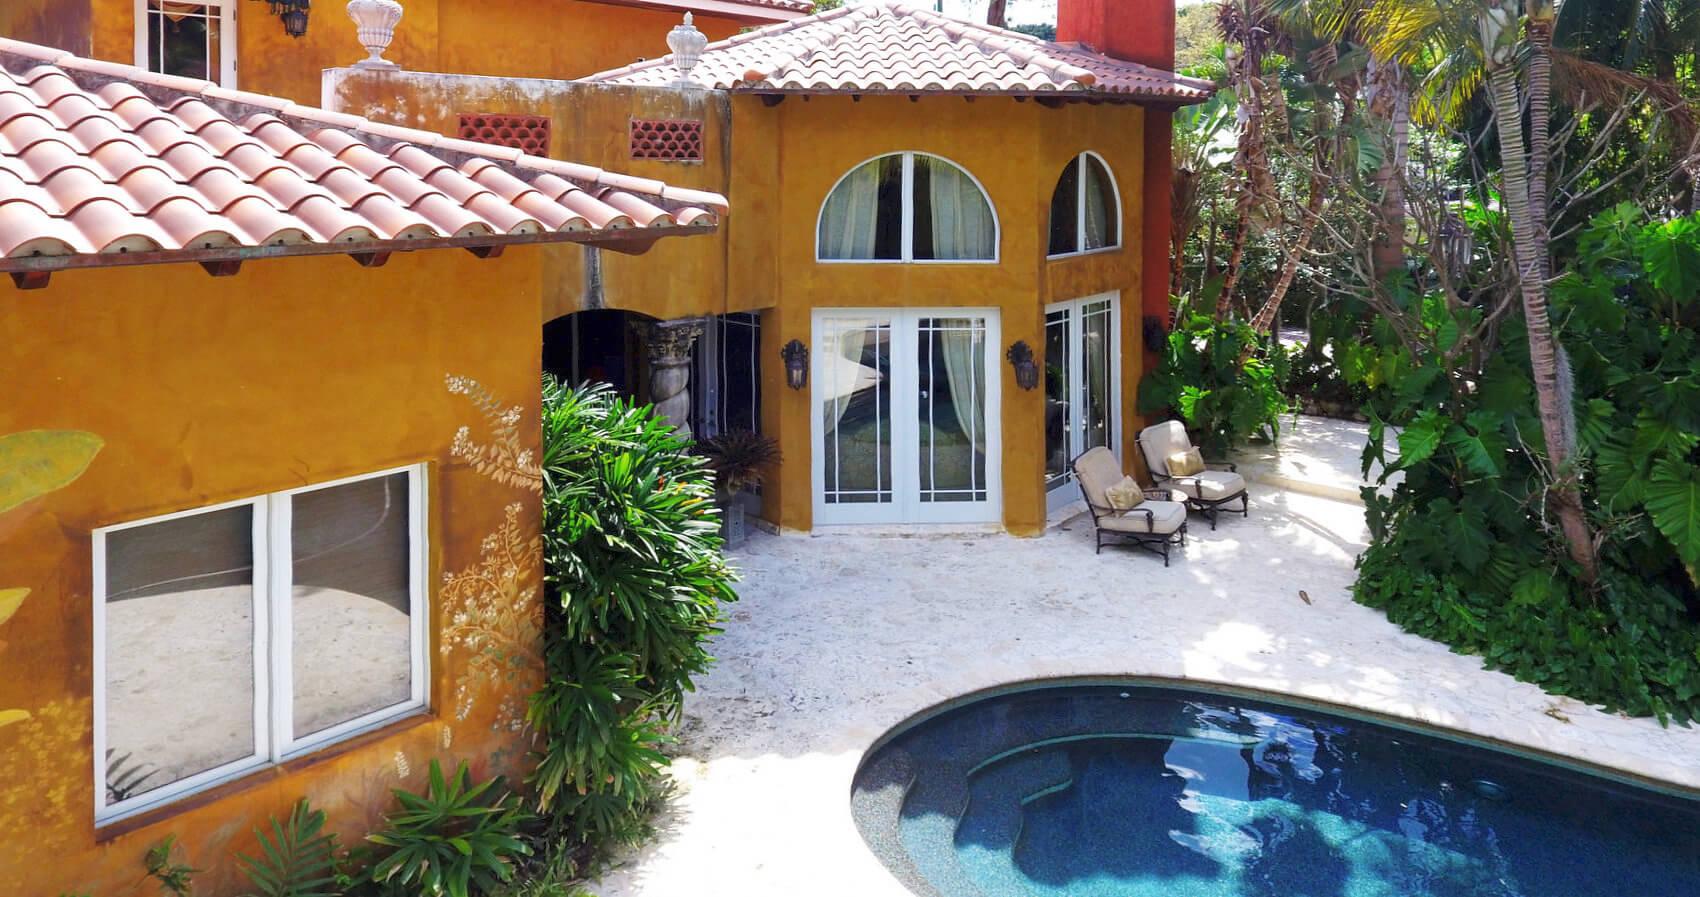 19__coconut_grove_aerial_photo_by_MiamiRealEstatePhotographers.com